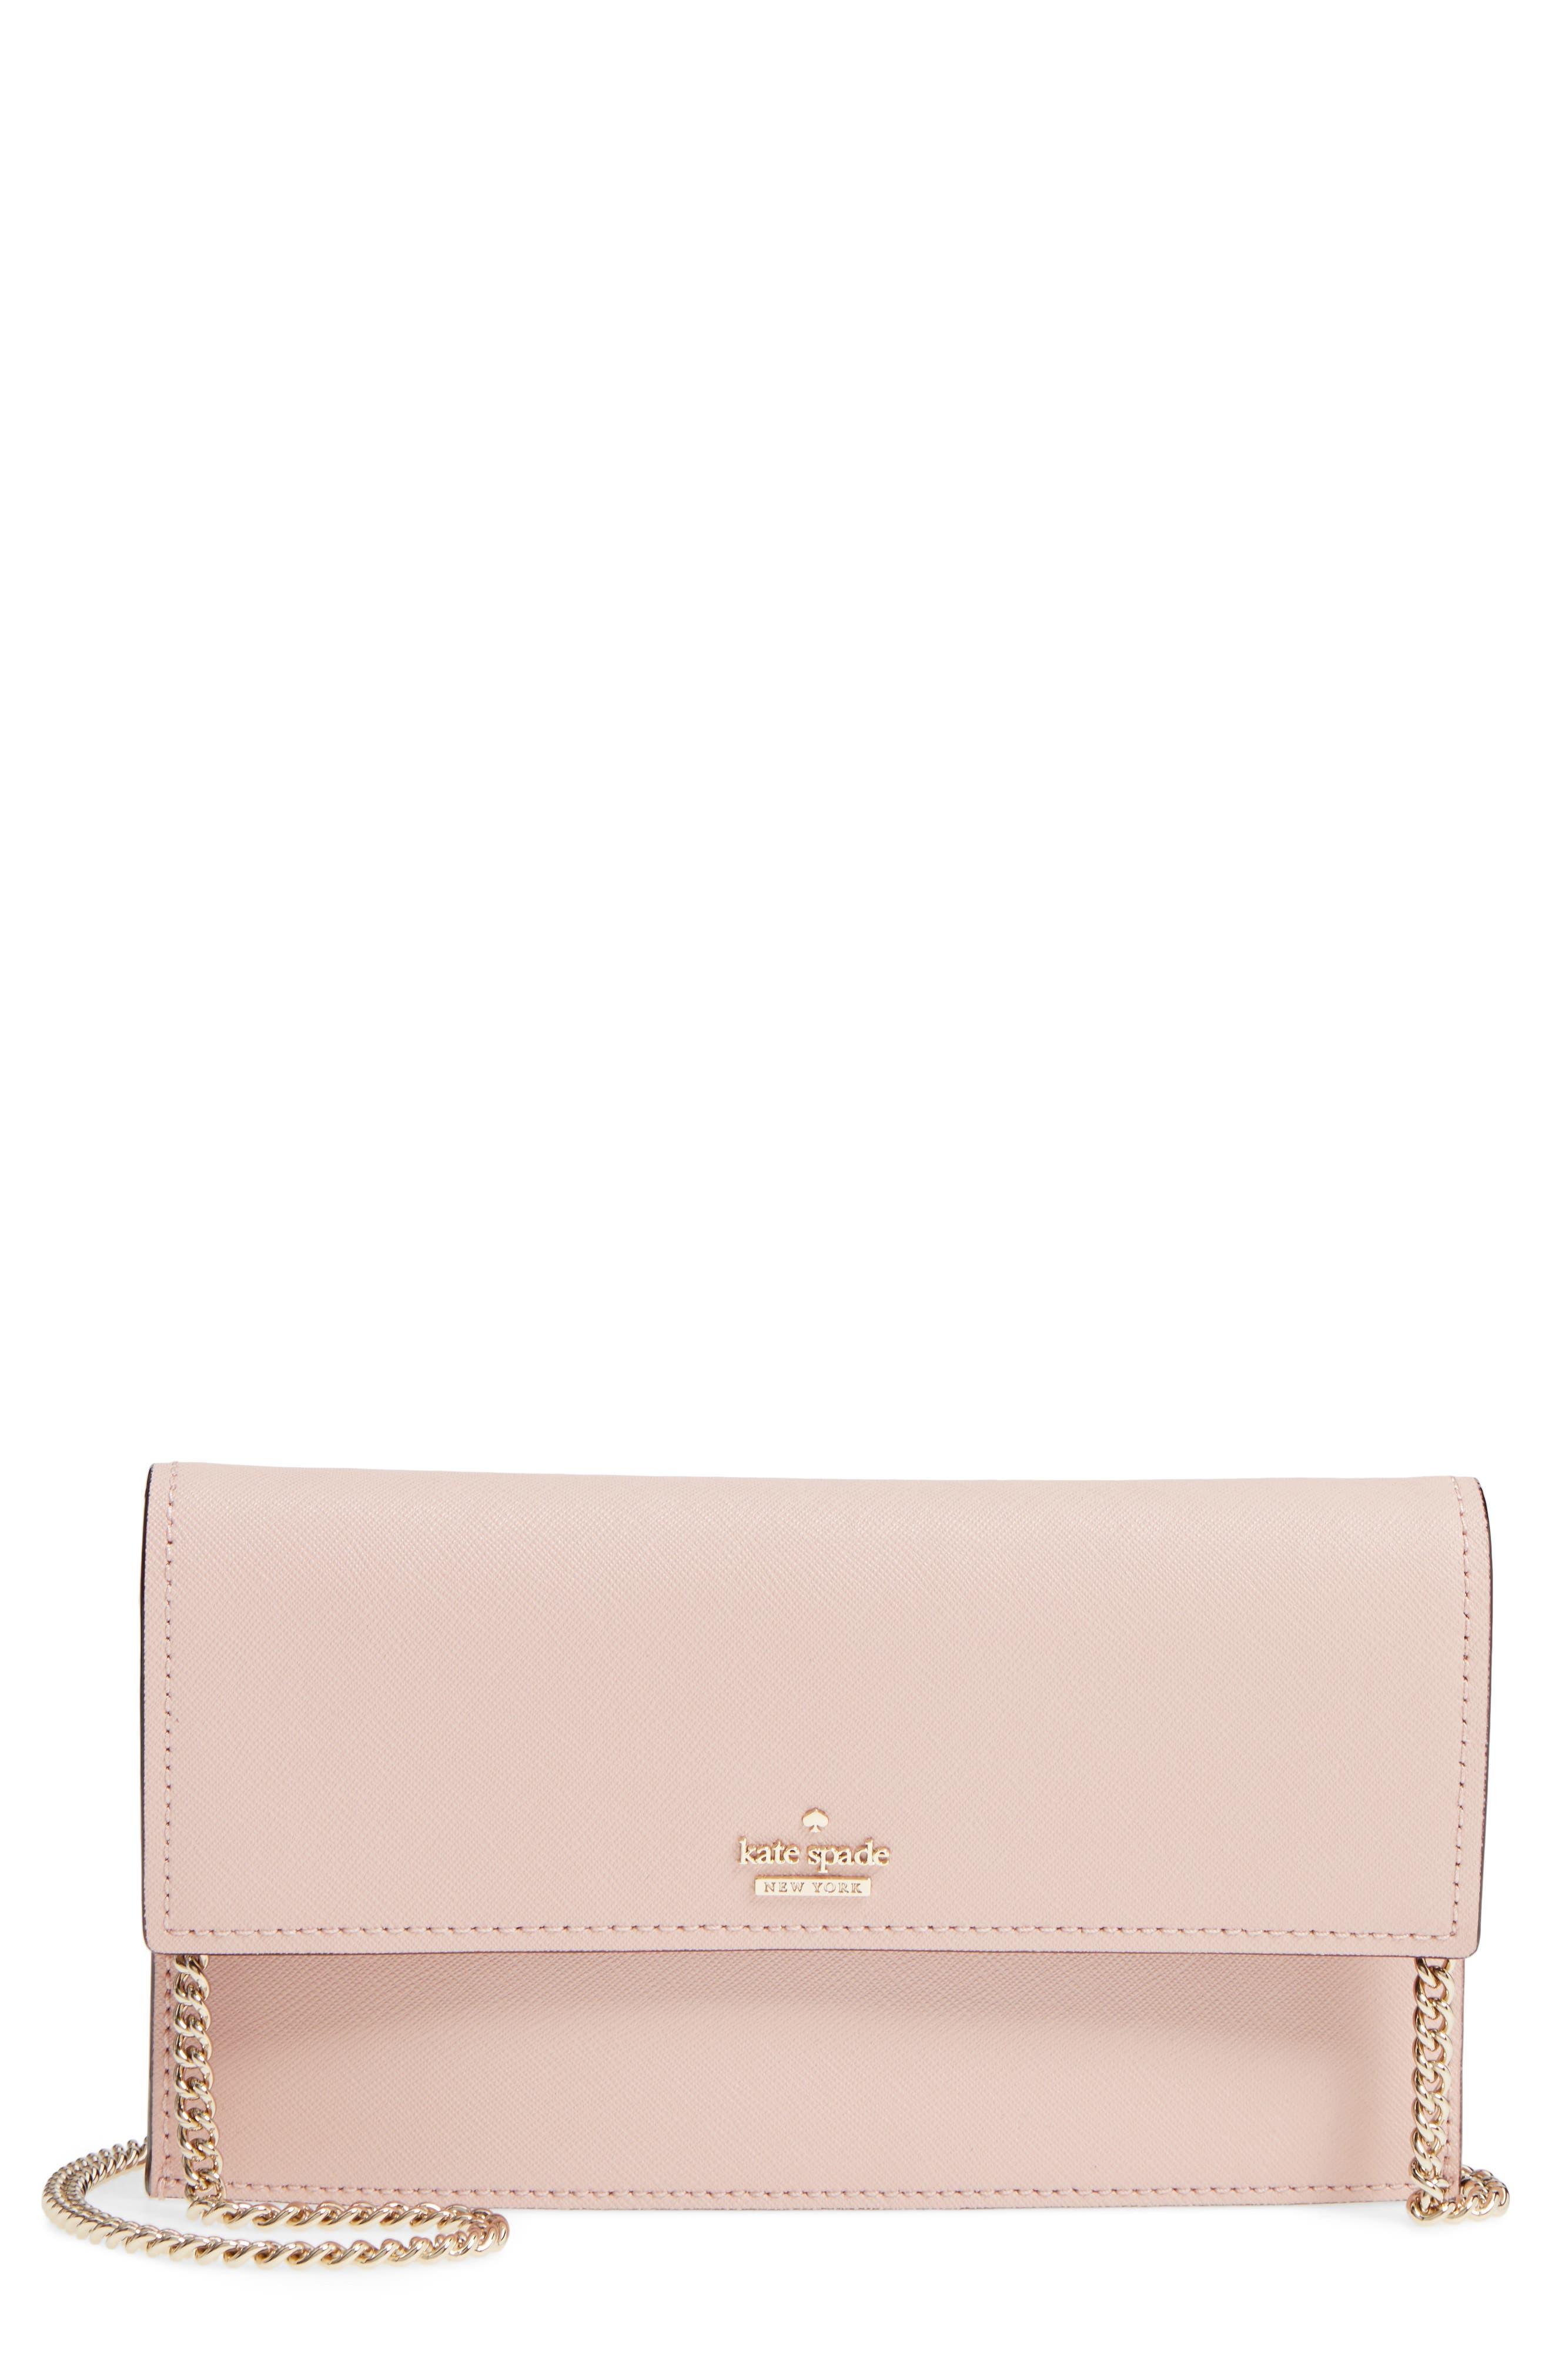 cameron street - brennan leather wallet & card case,                         Main,                         color, Warm Vellum